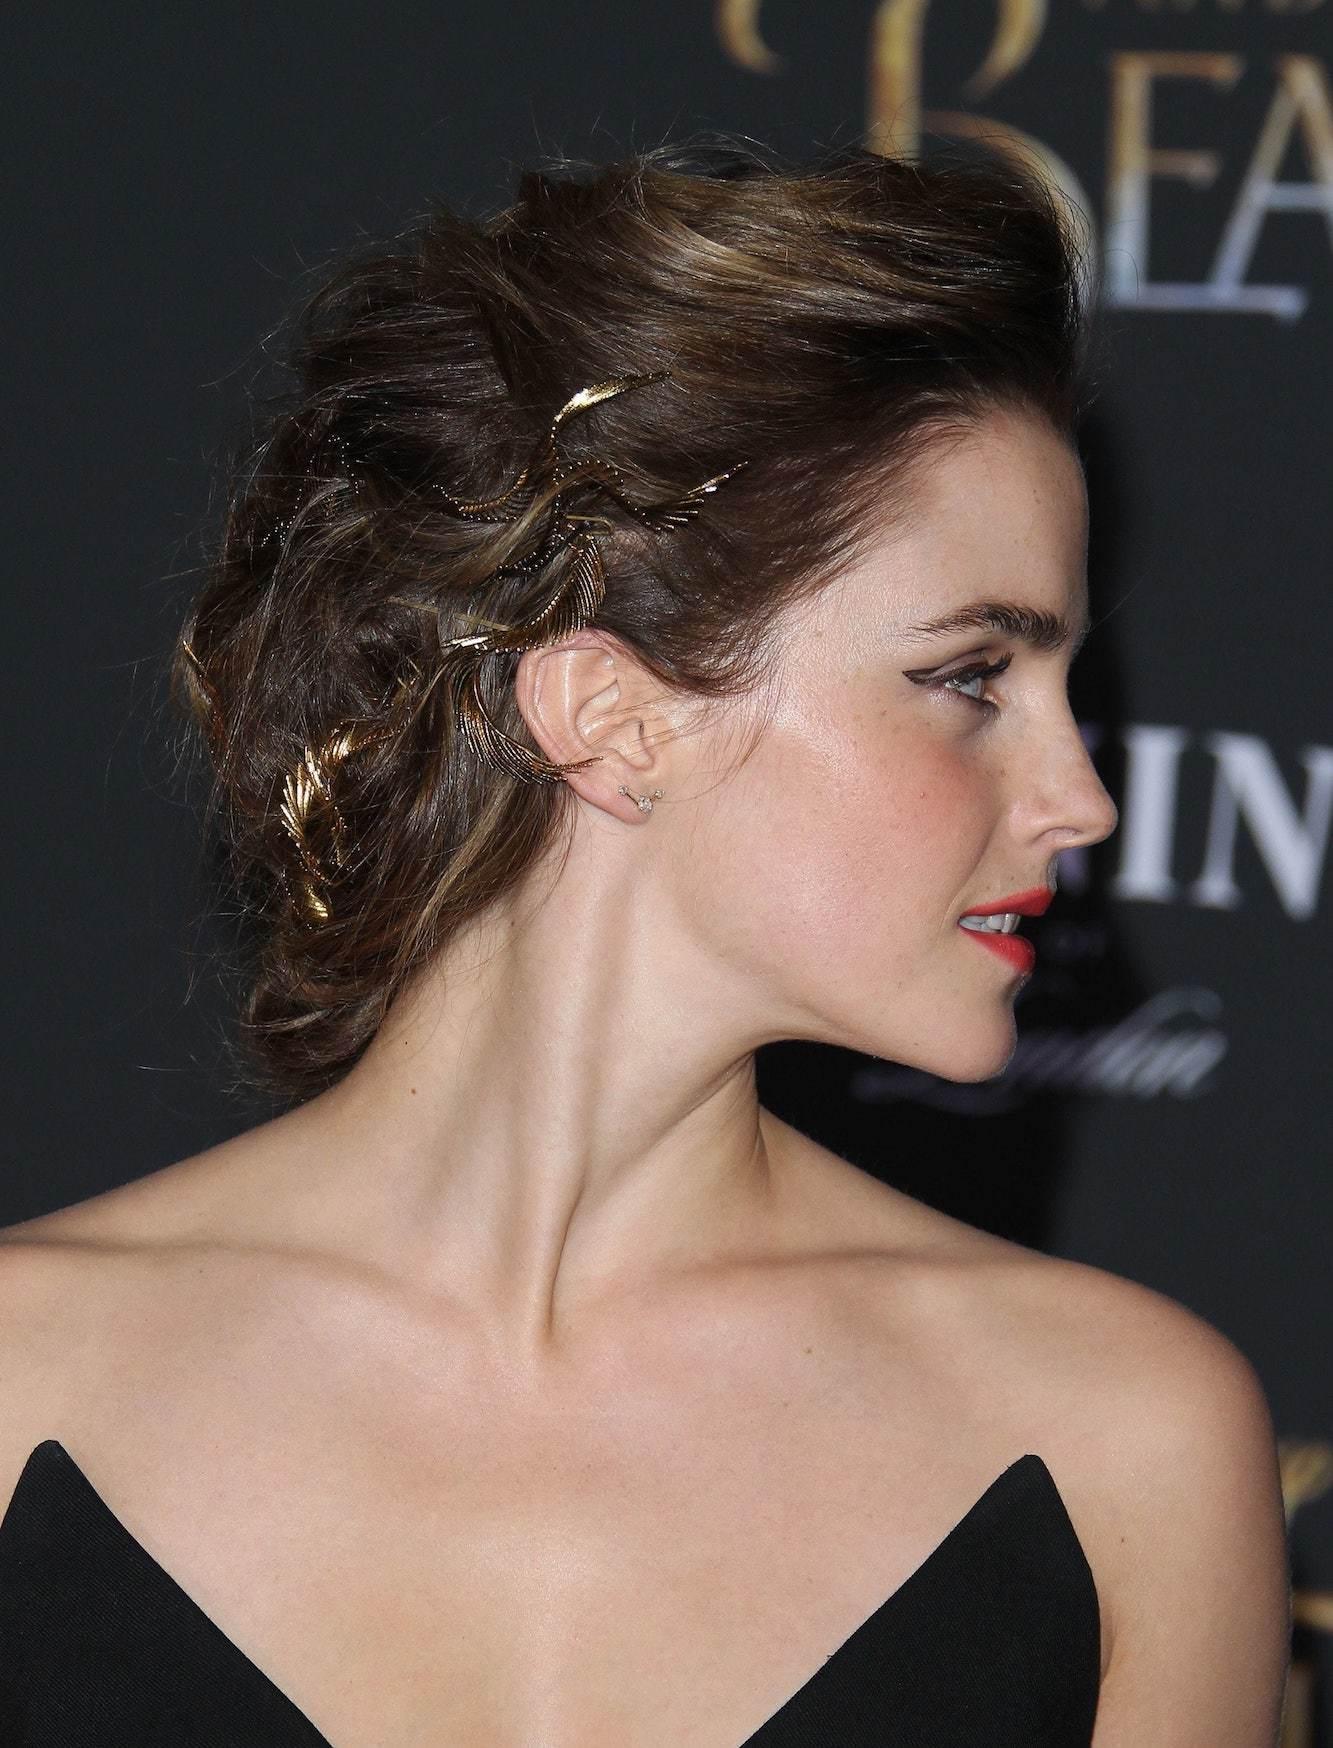 Emma watson braided updo dengan gold wire.